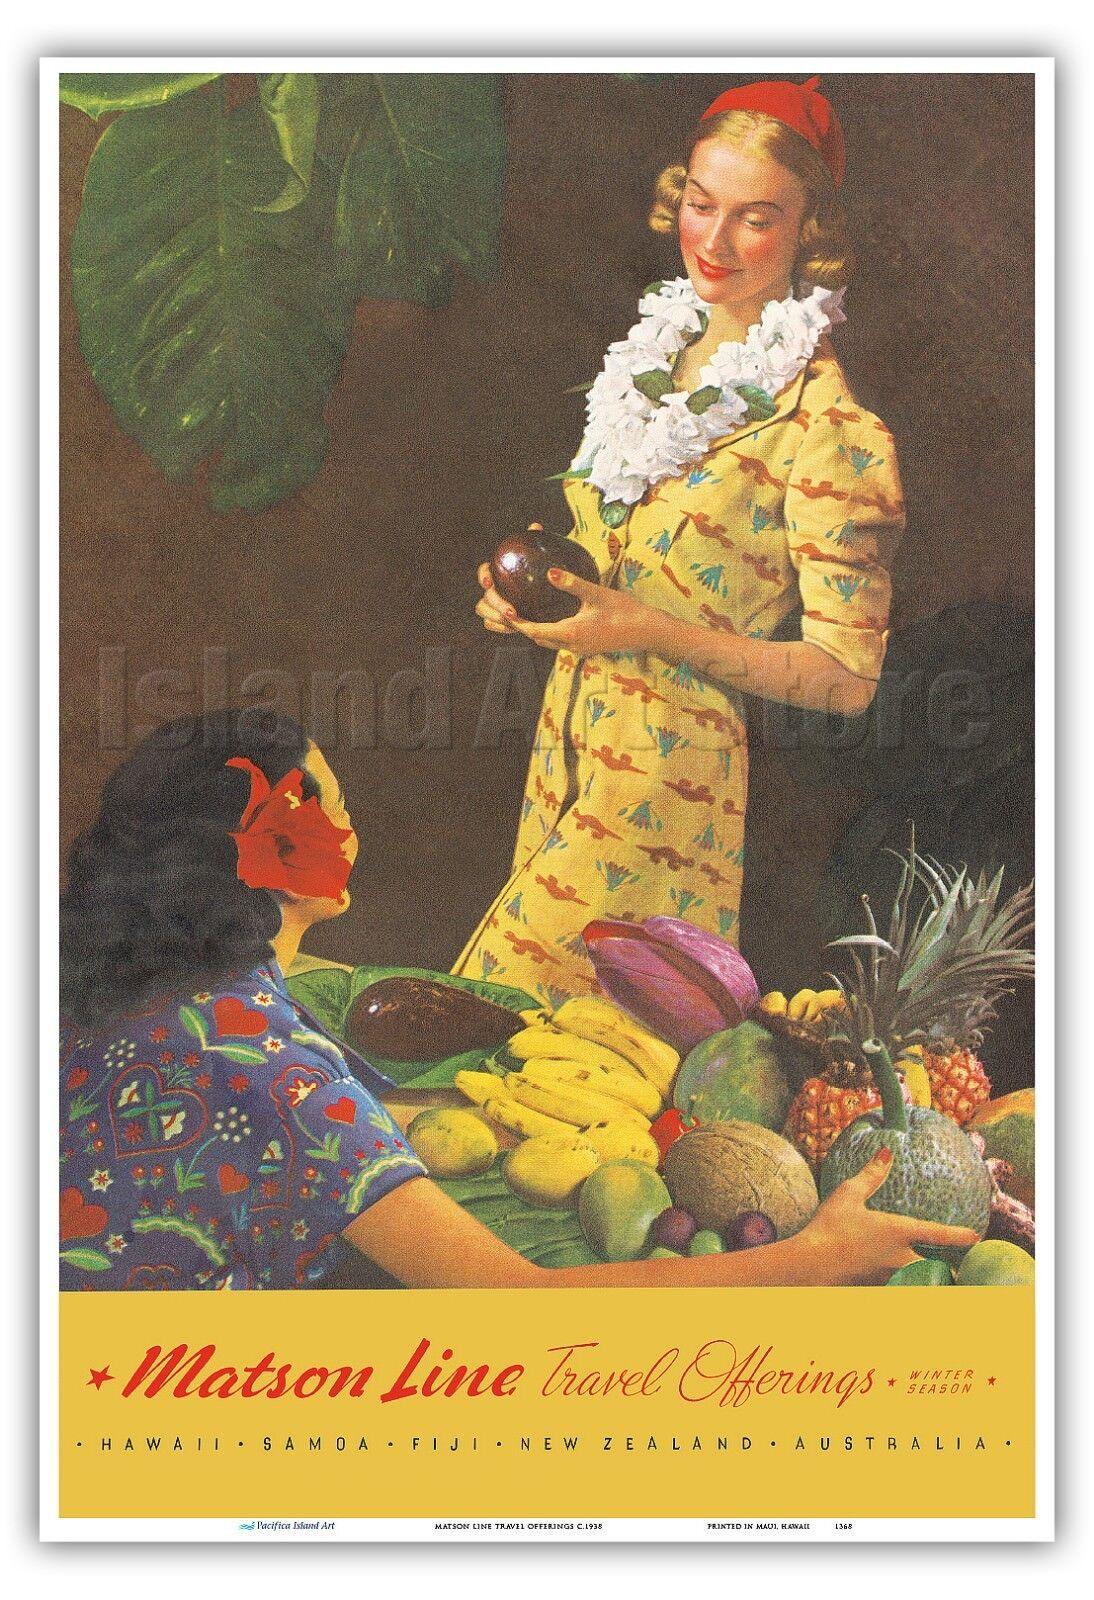 Tahiti Matson Line Menu Cover Macouillard 1957 Vintage Travel Poster Print